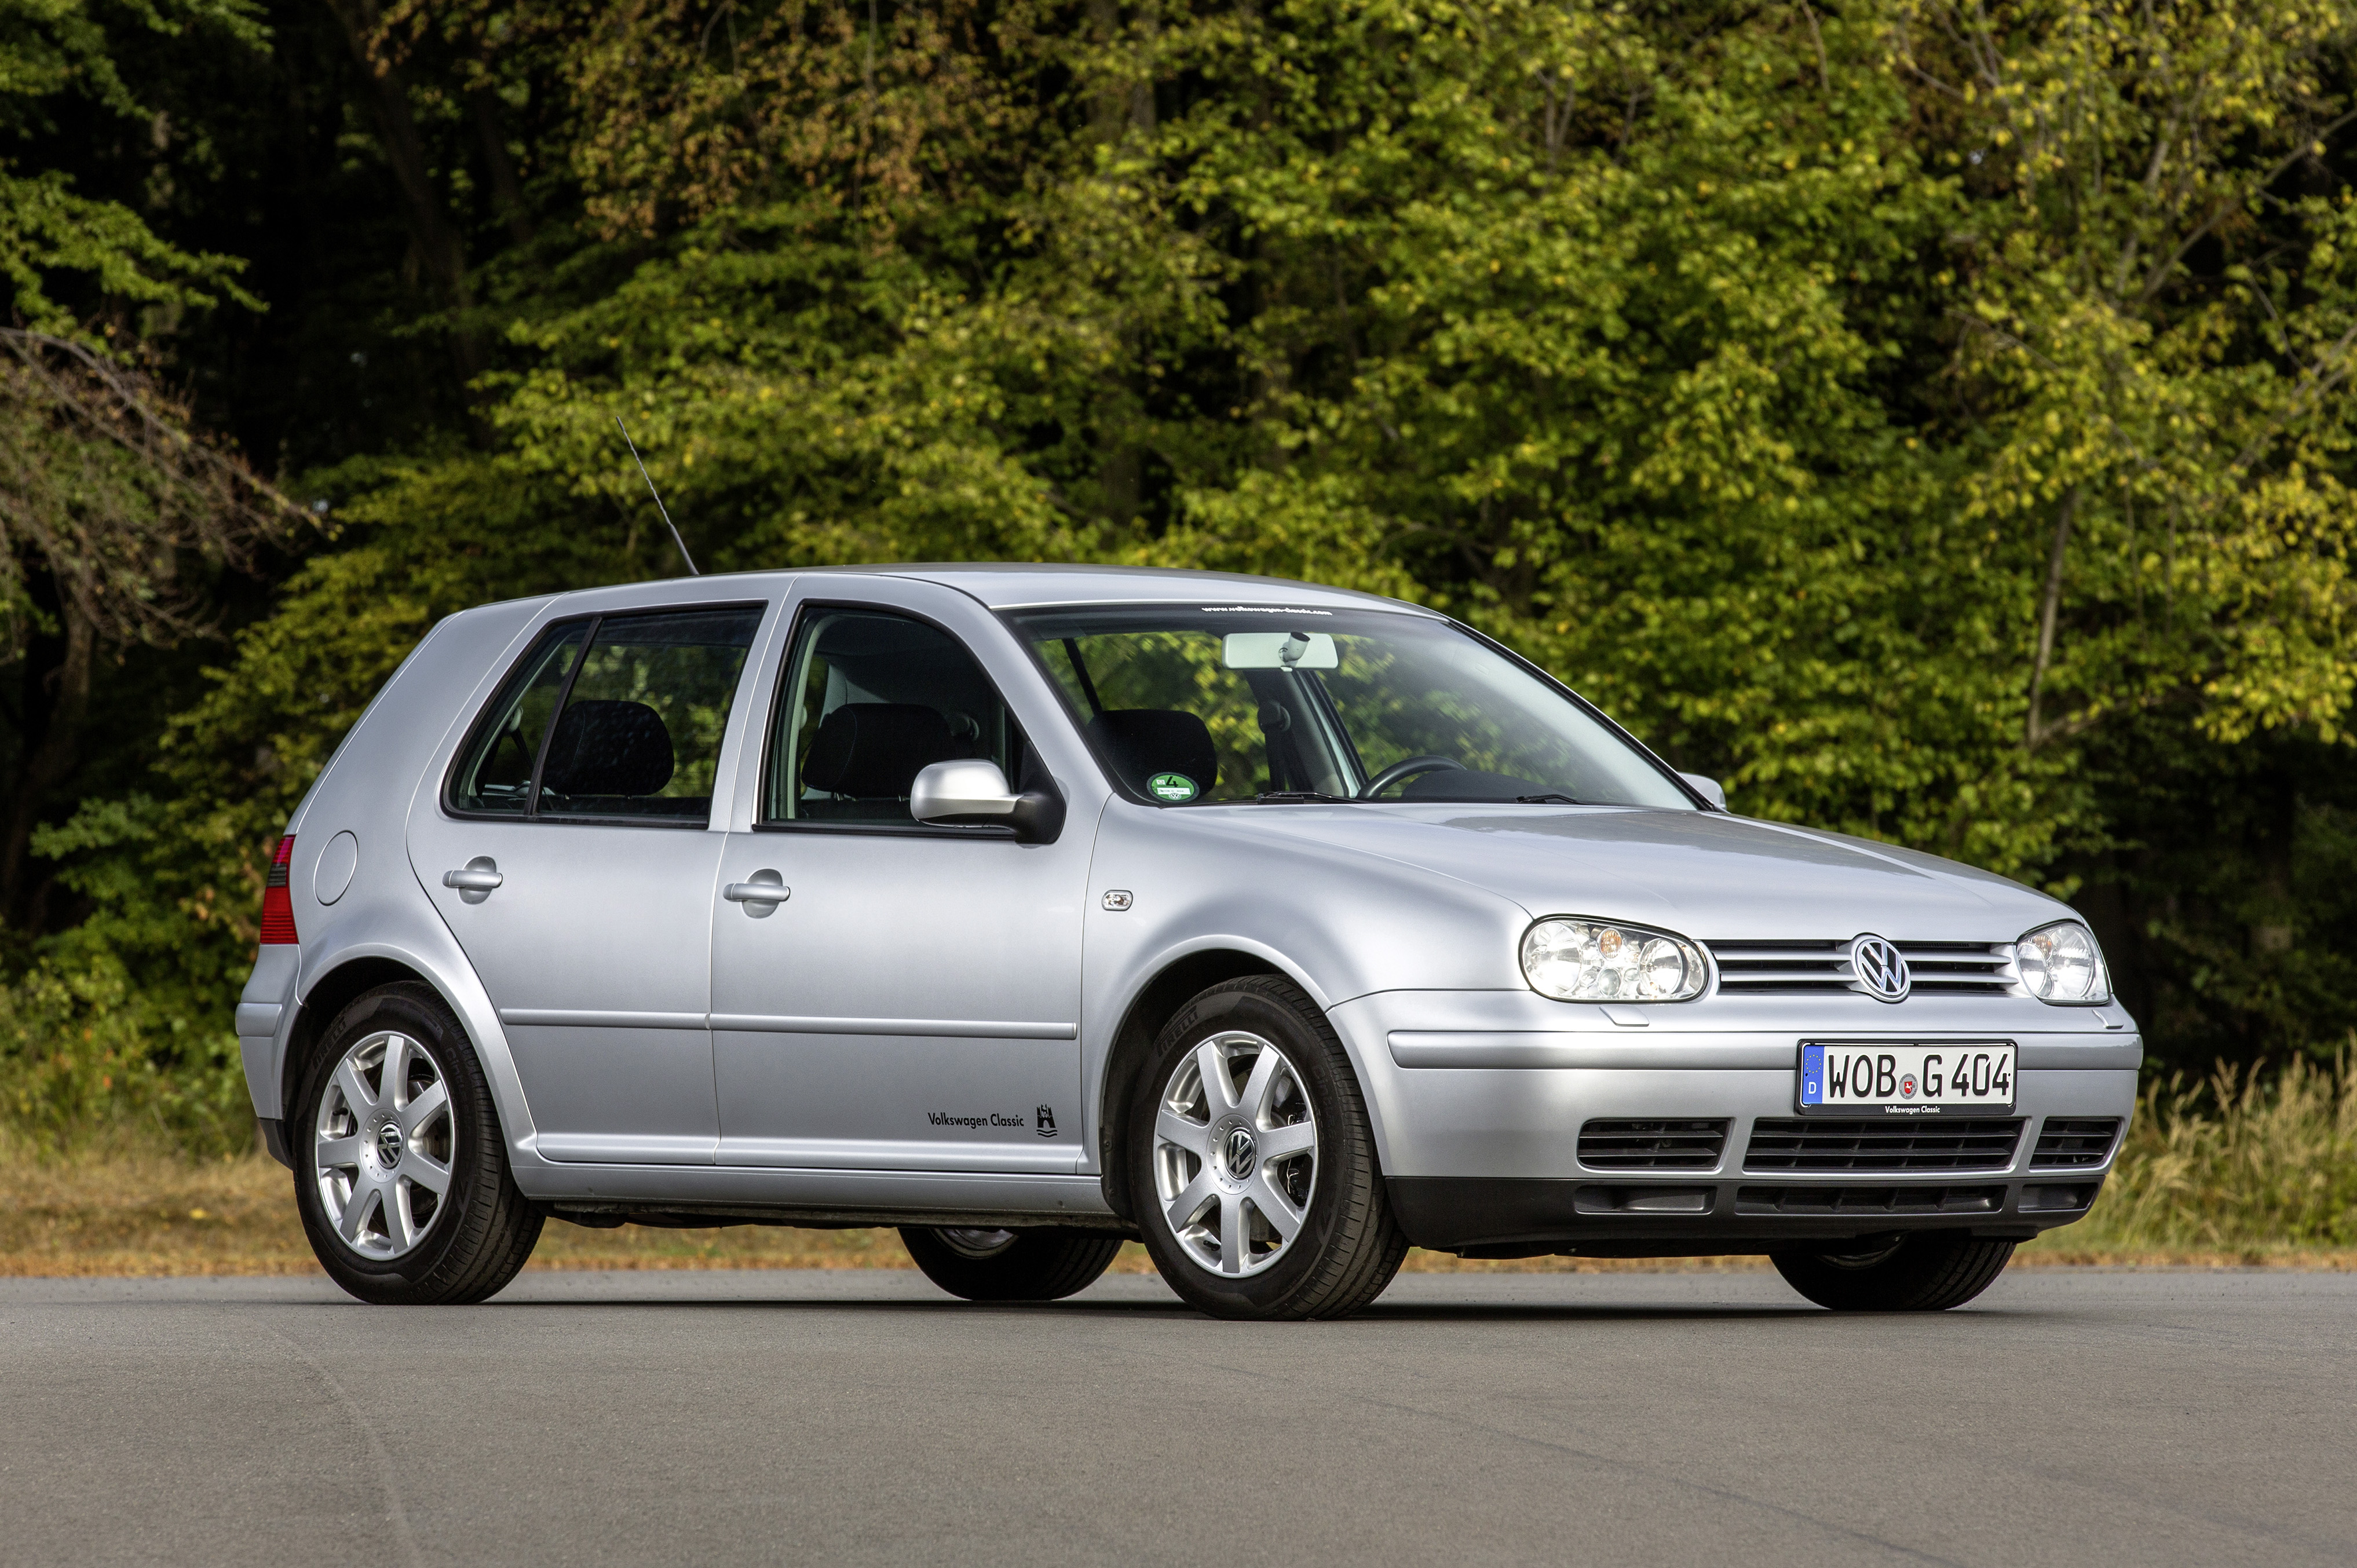 service manual  vw golf mk4 bora 1997  the ideal sleeper 2003 Audi A4 Sedan Engines 2003 Audi A4 Transmission Bolts